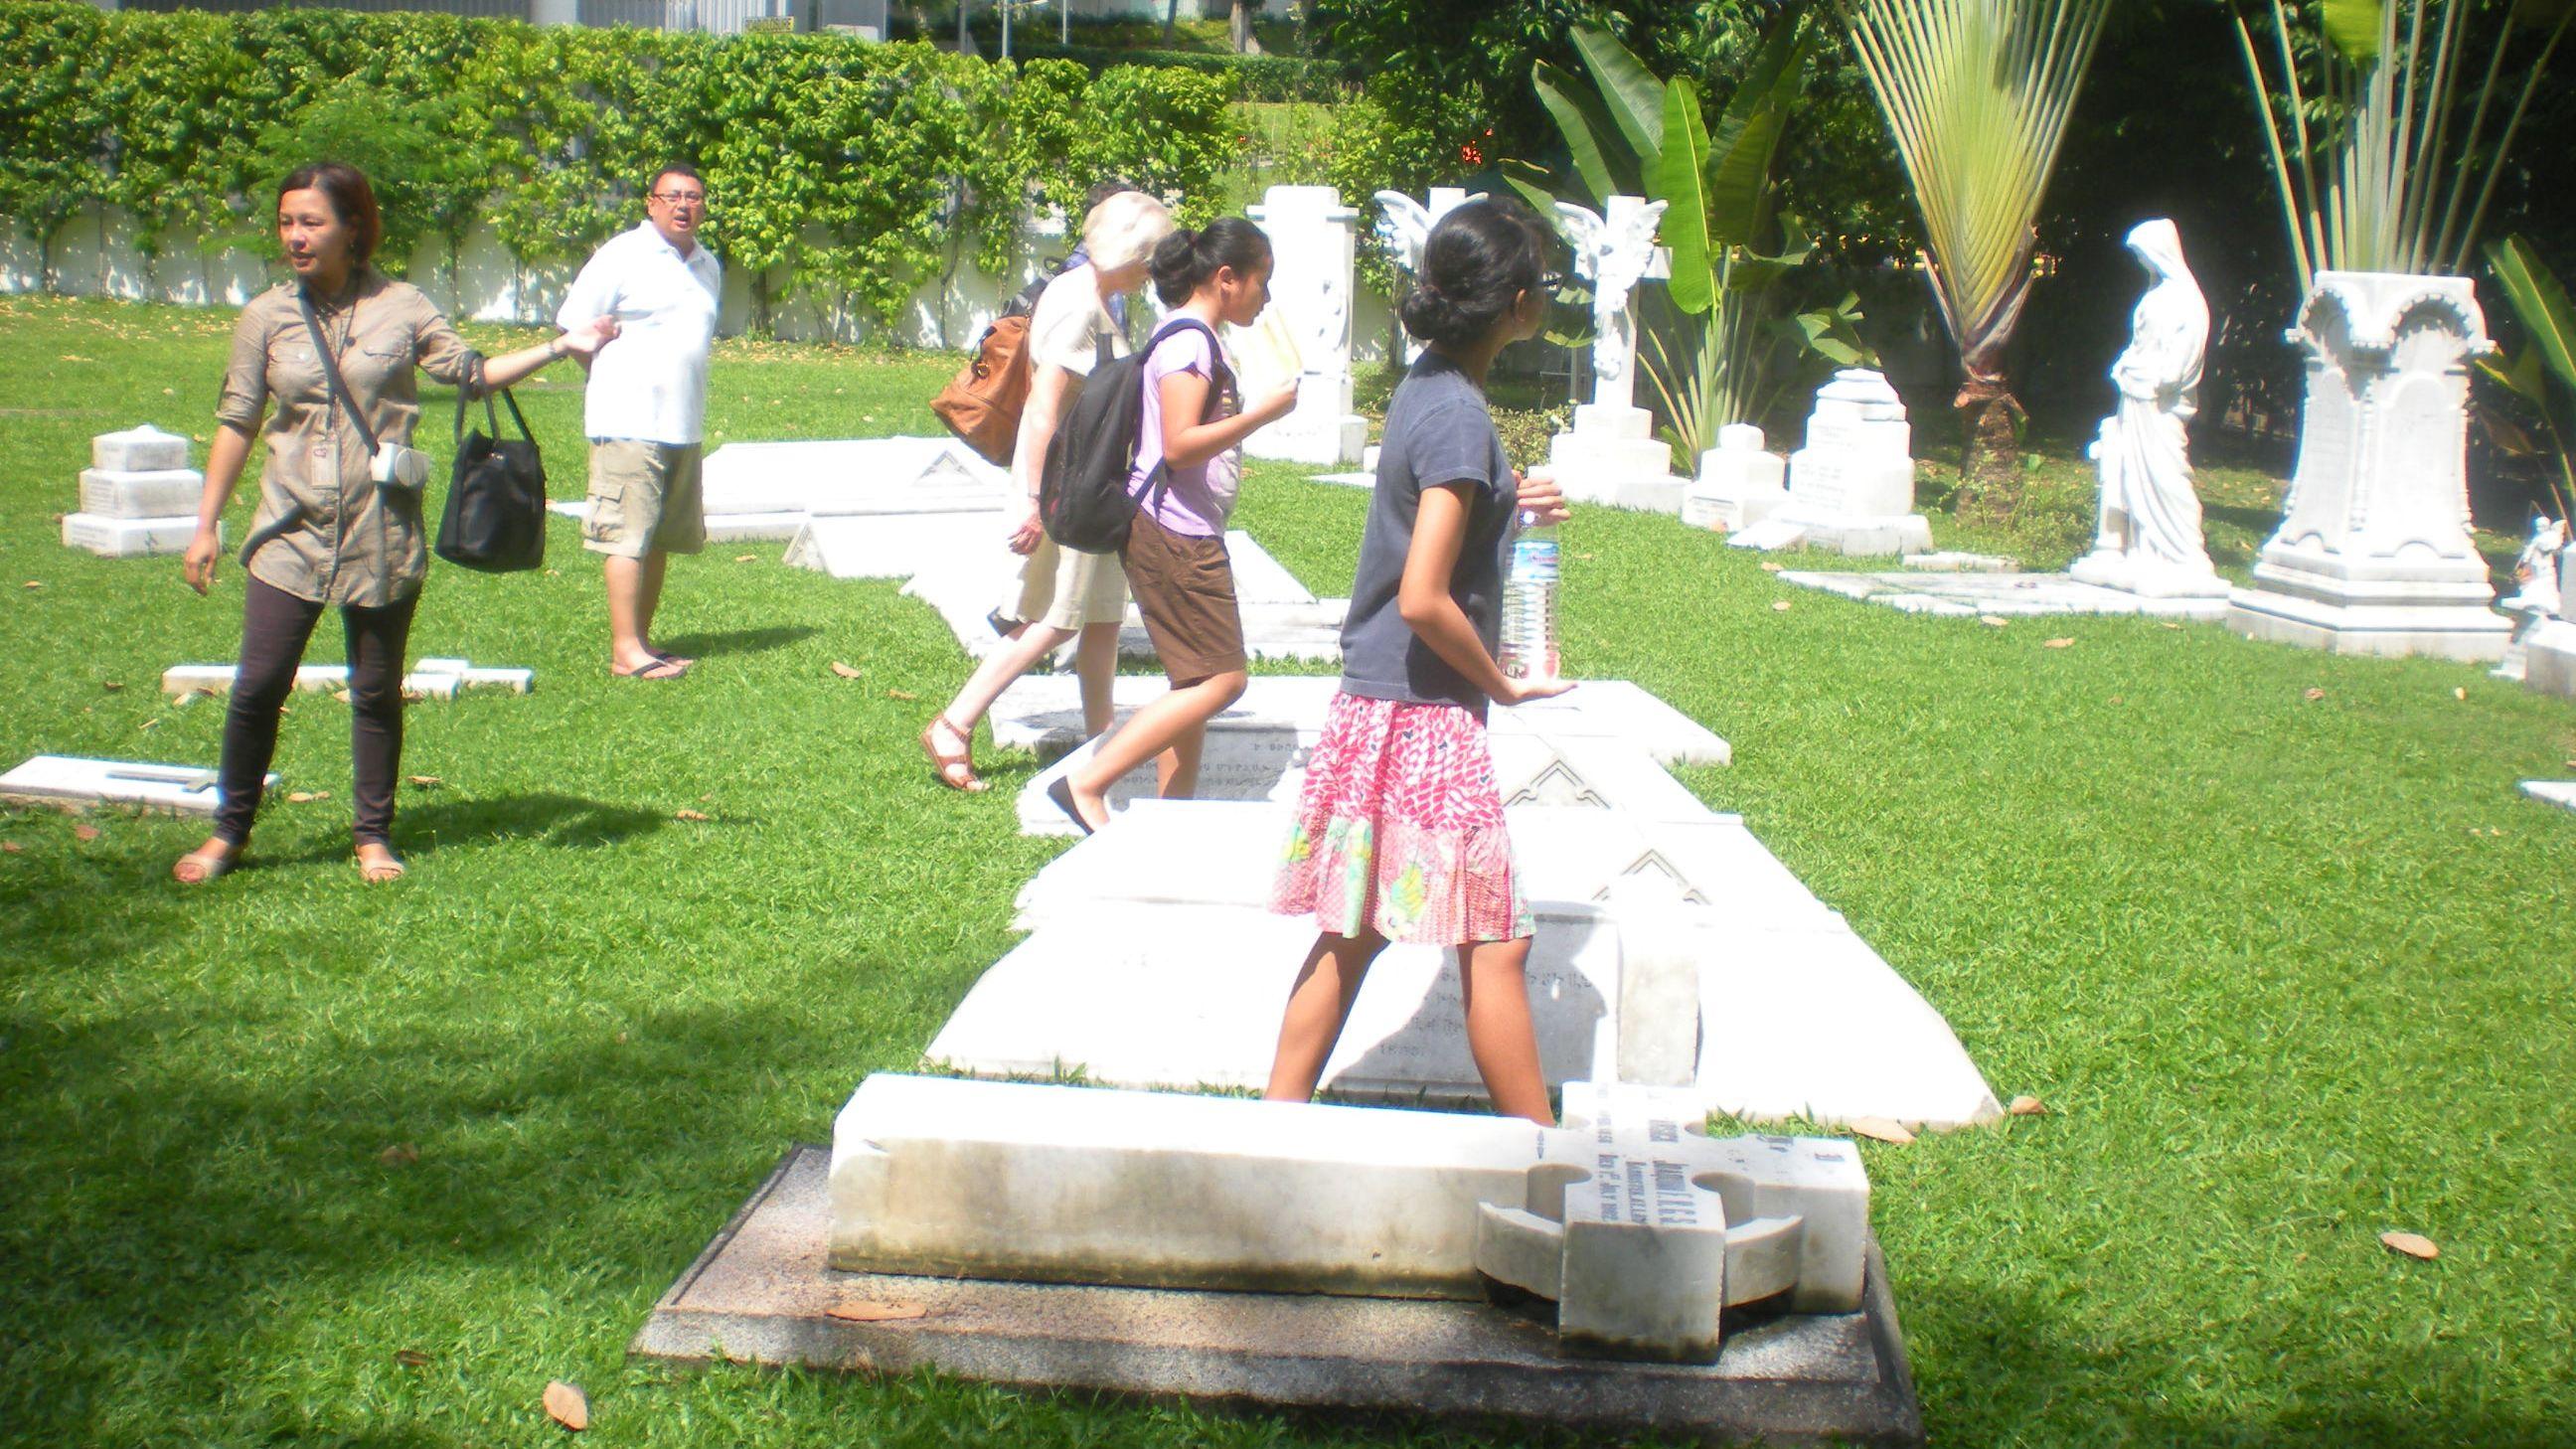 People walking in an grave yard in Singapore